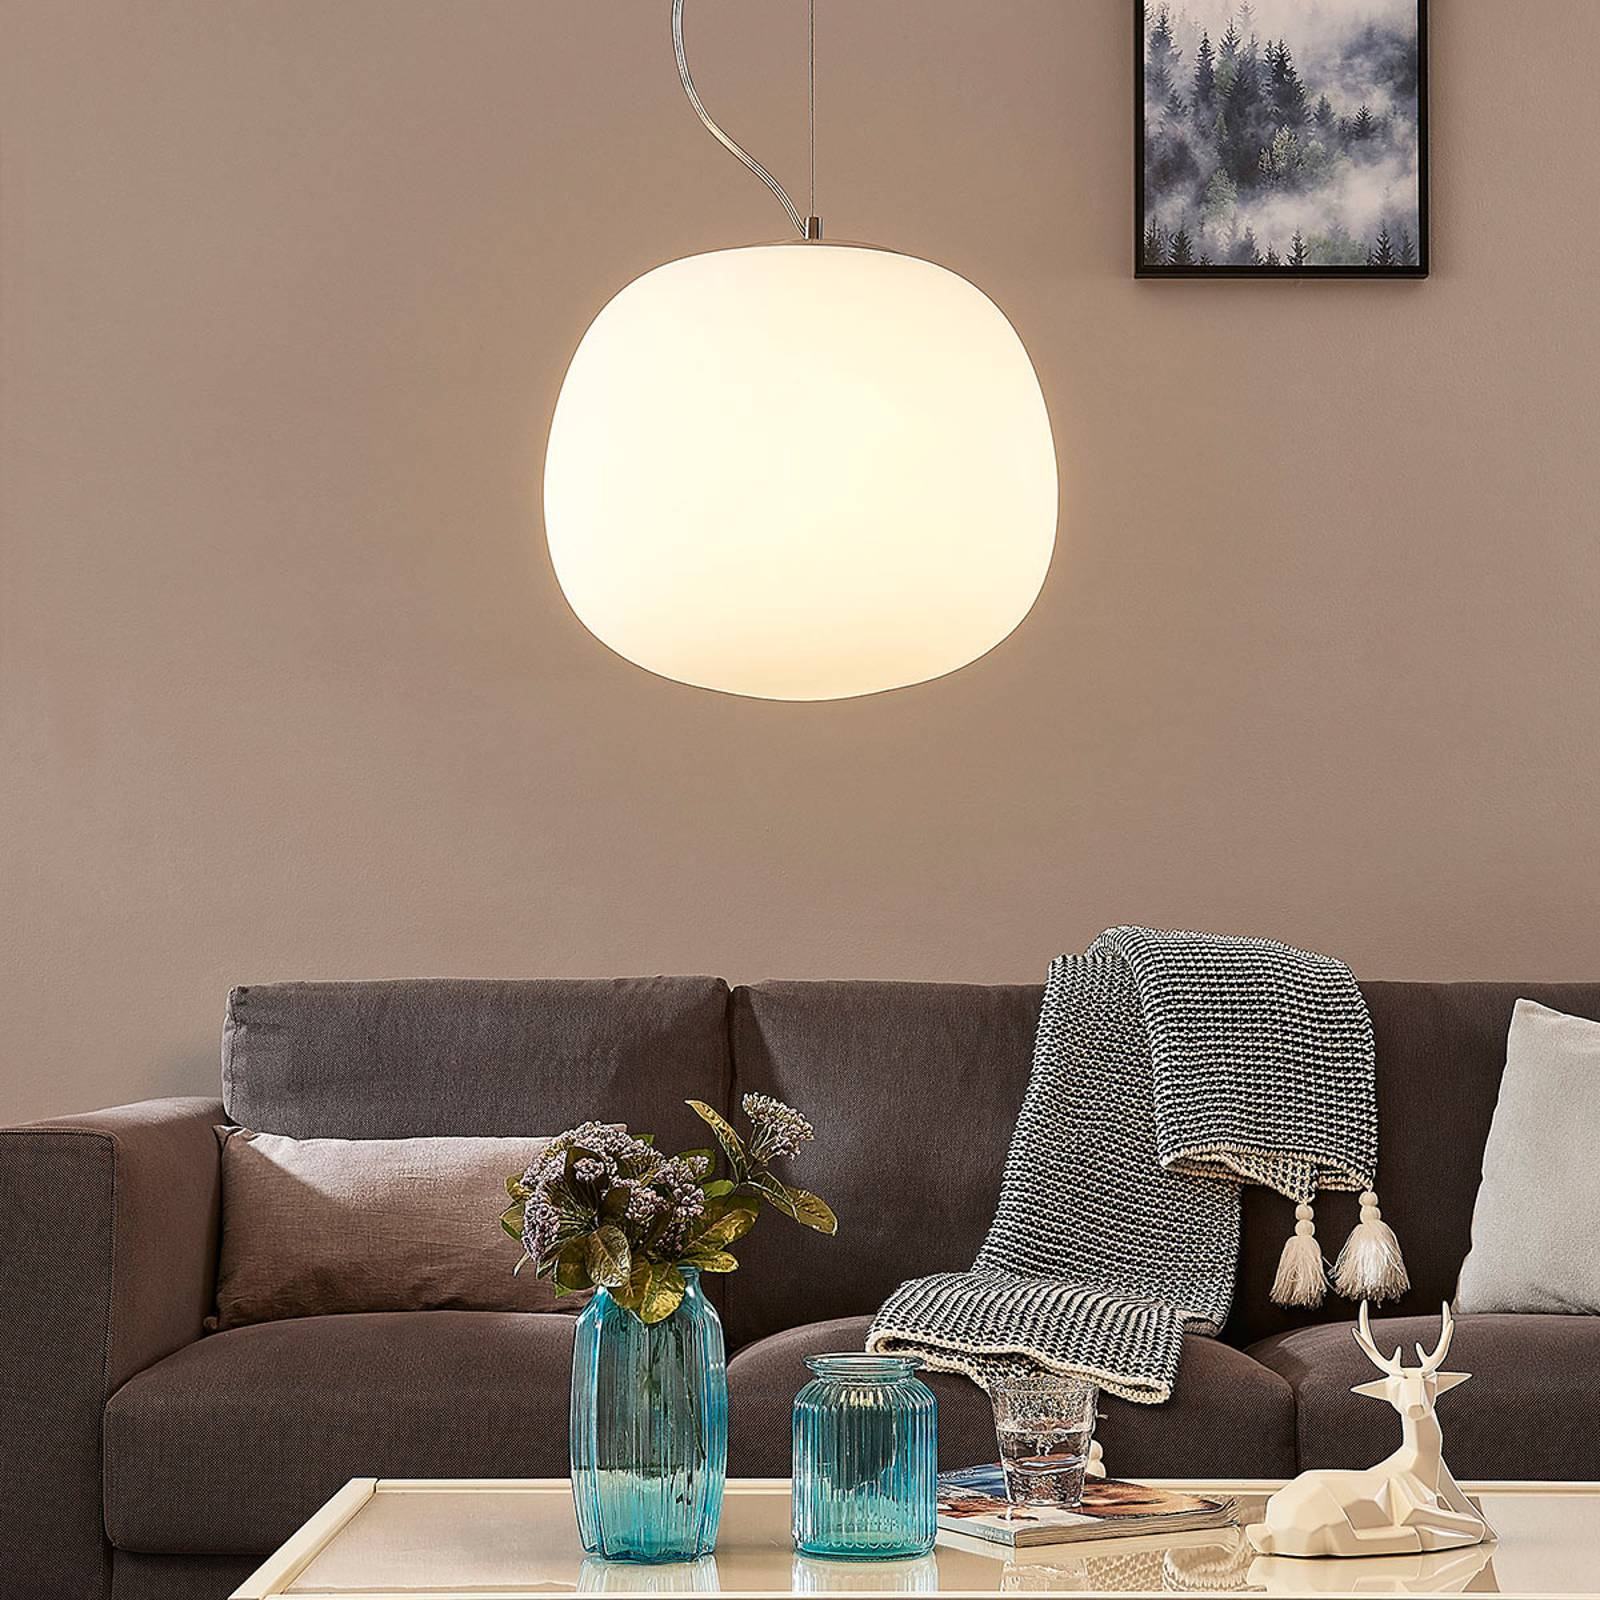 Glazen hanglamp Ginevra, rond, wit, 38 cm